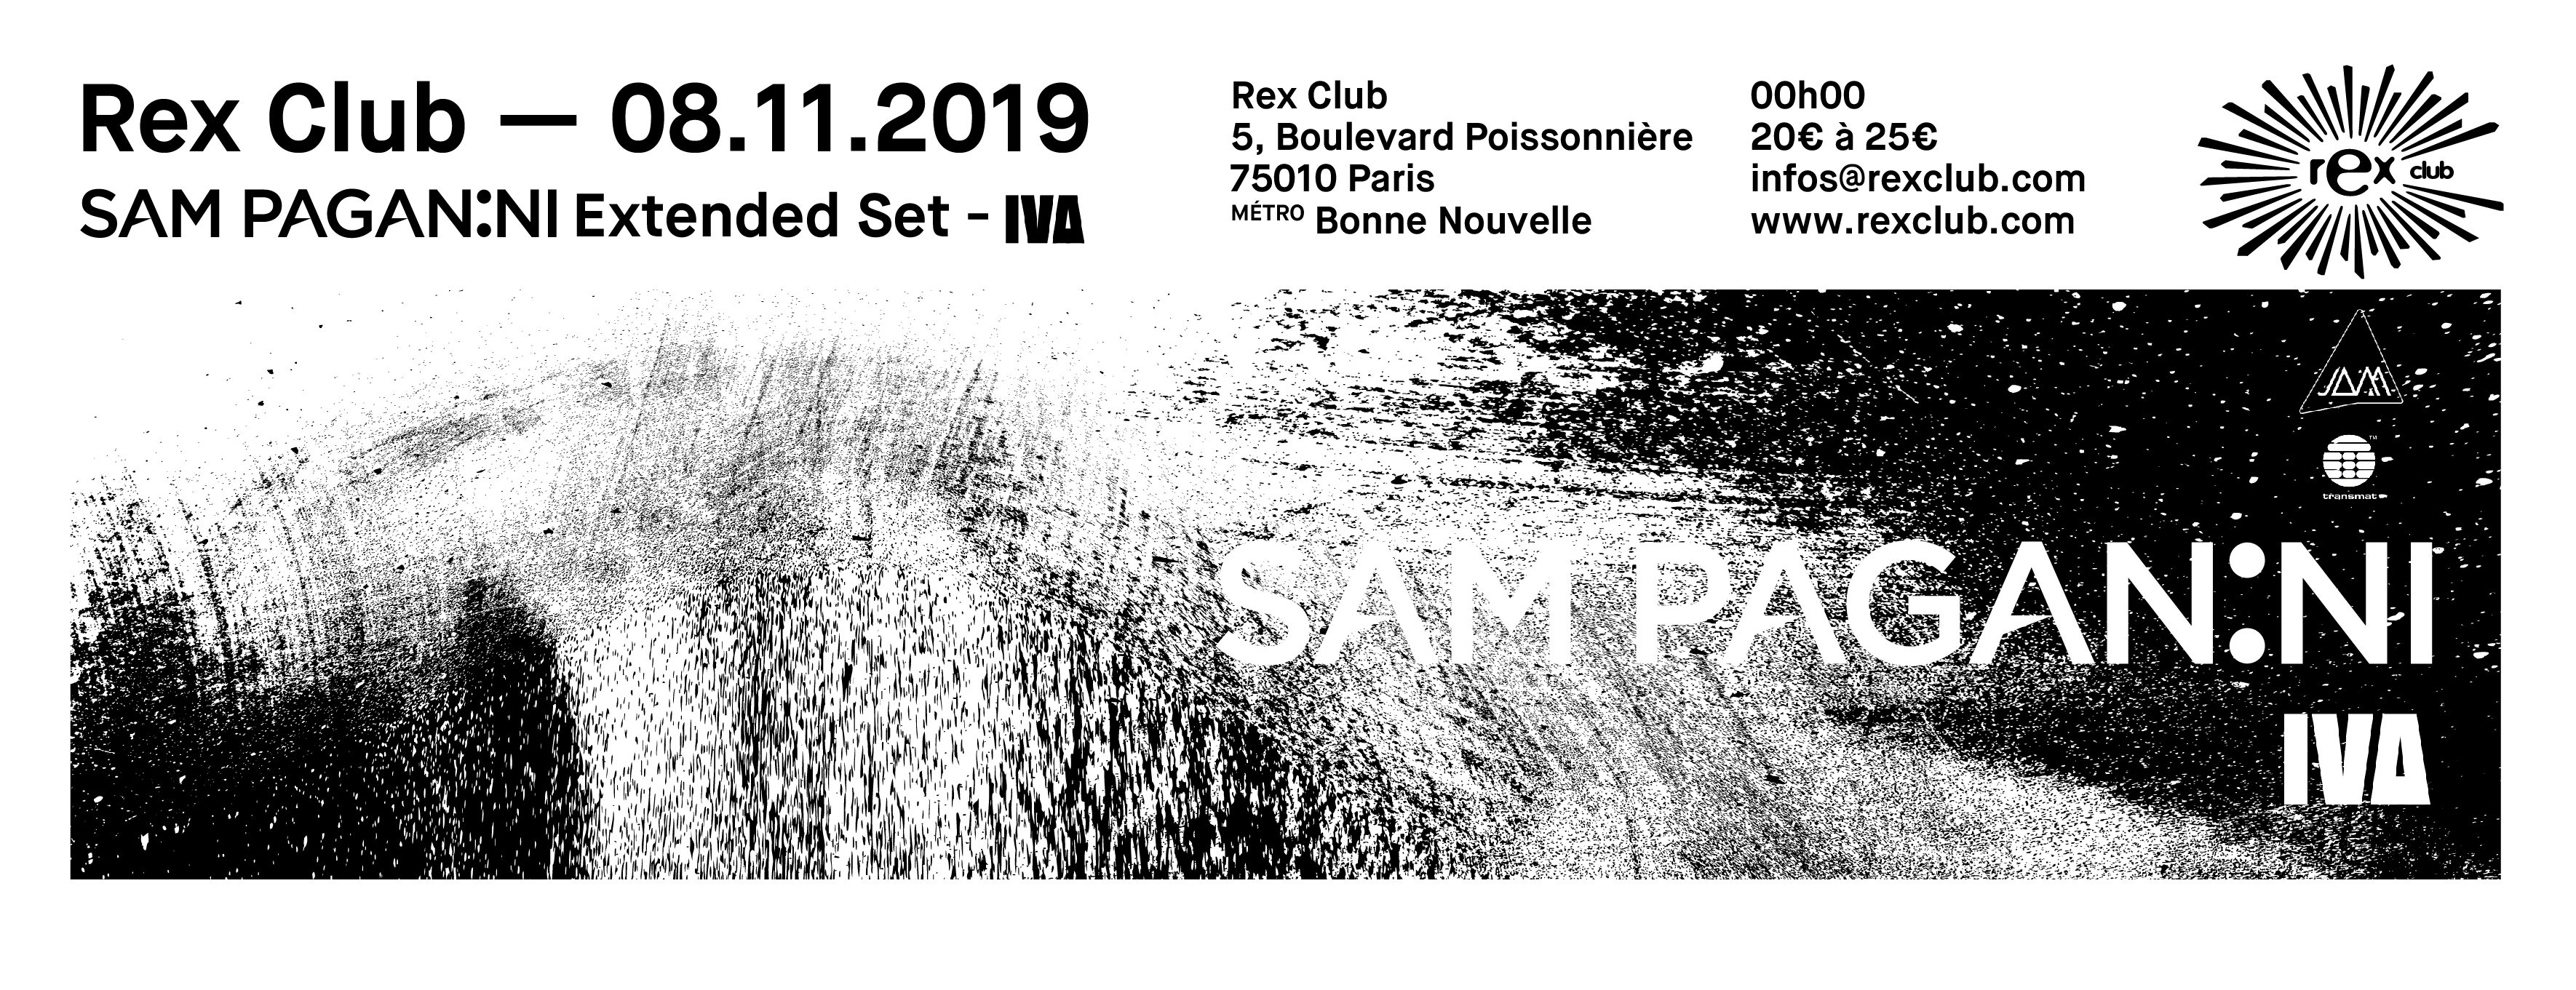 Rex Club presente: Sam Paganini Extended Set & IVA